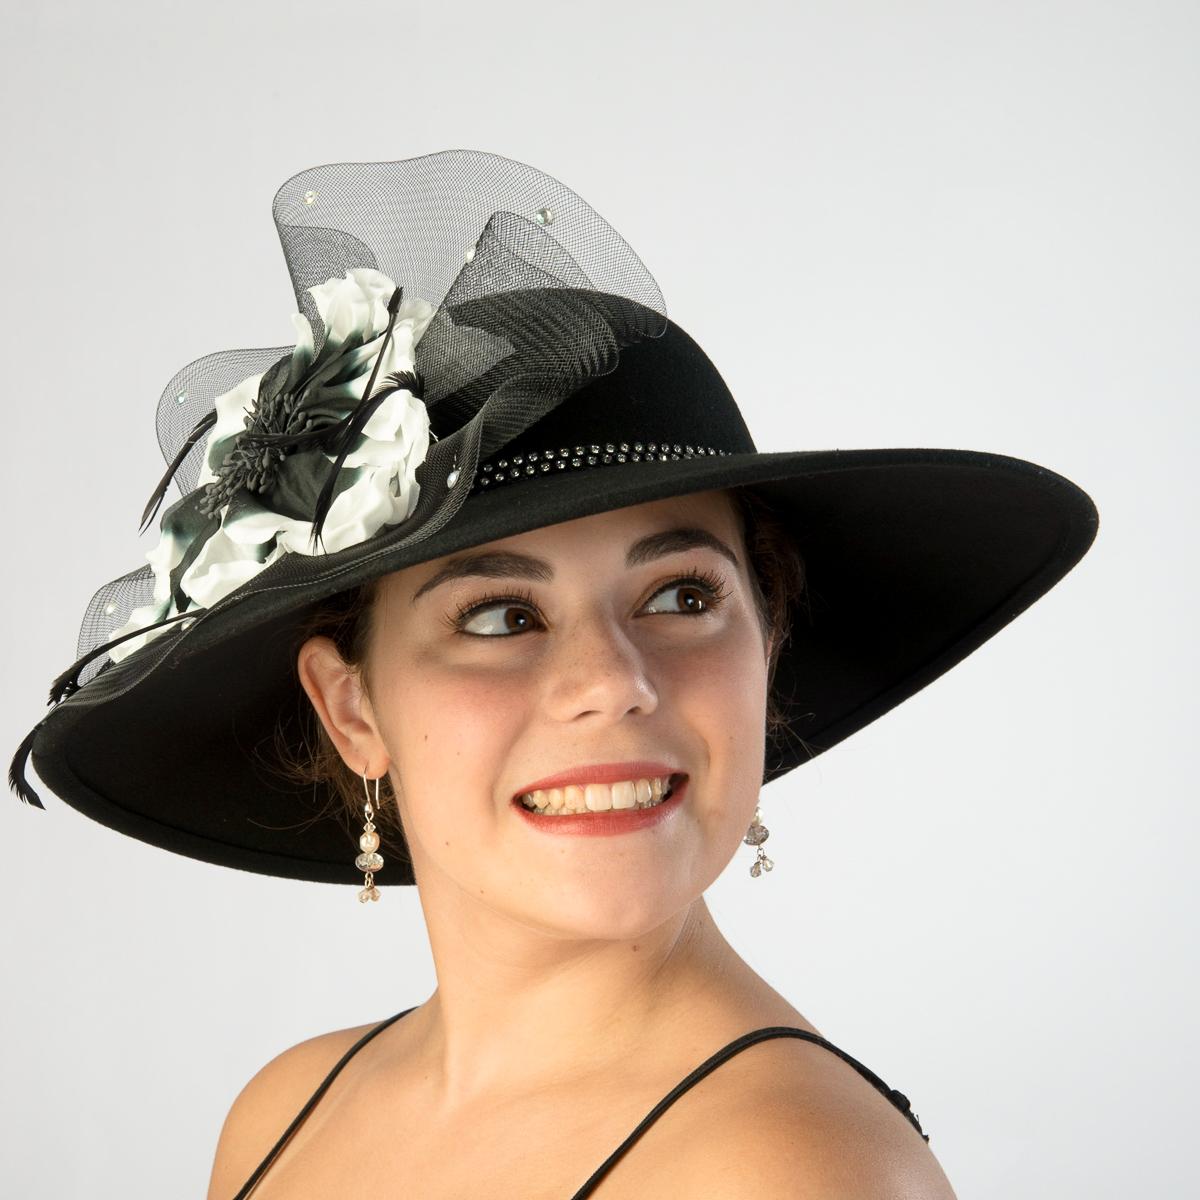 Black Ivory Swinger With Large Silk Flower Hats 400634 Bkiv Sun